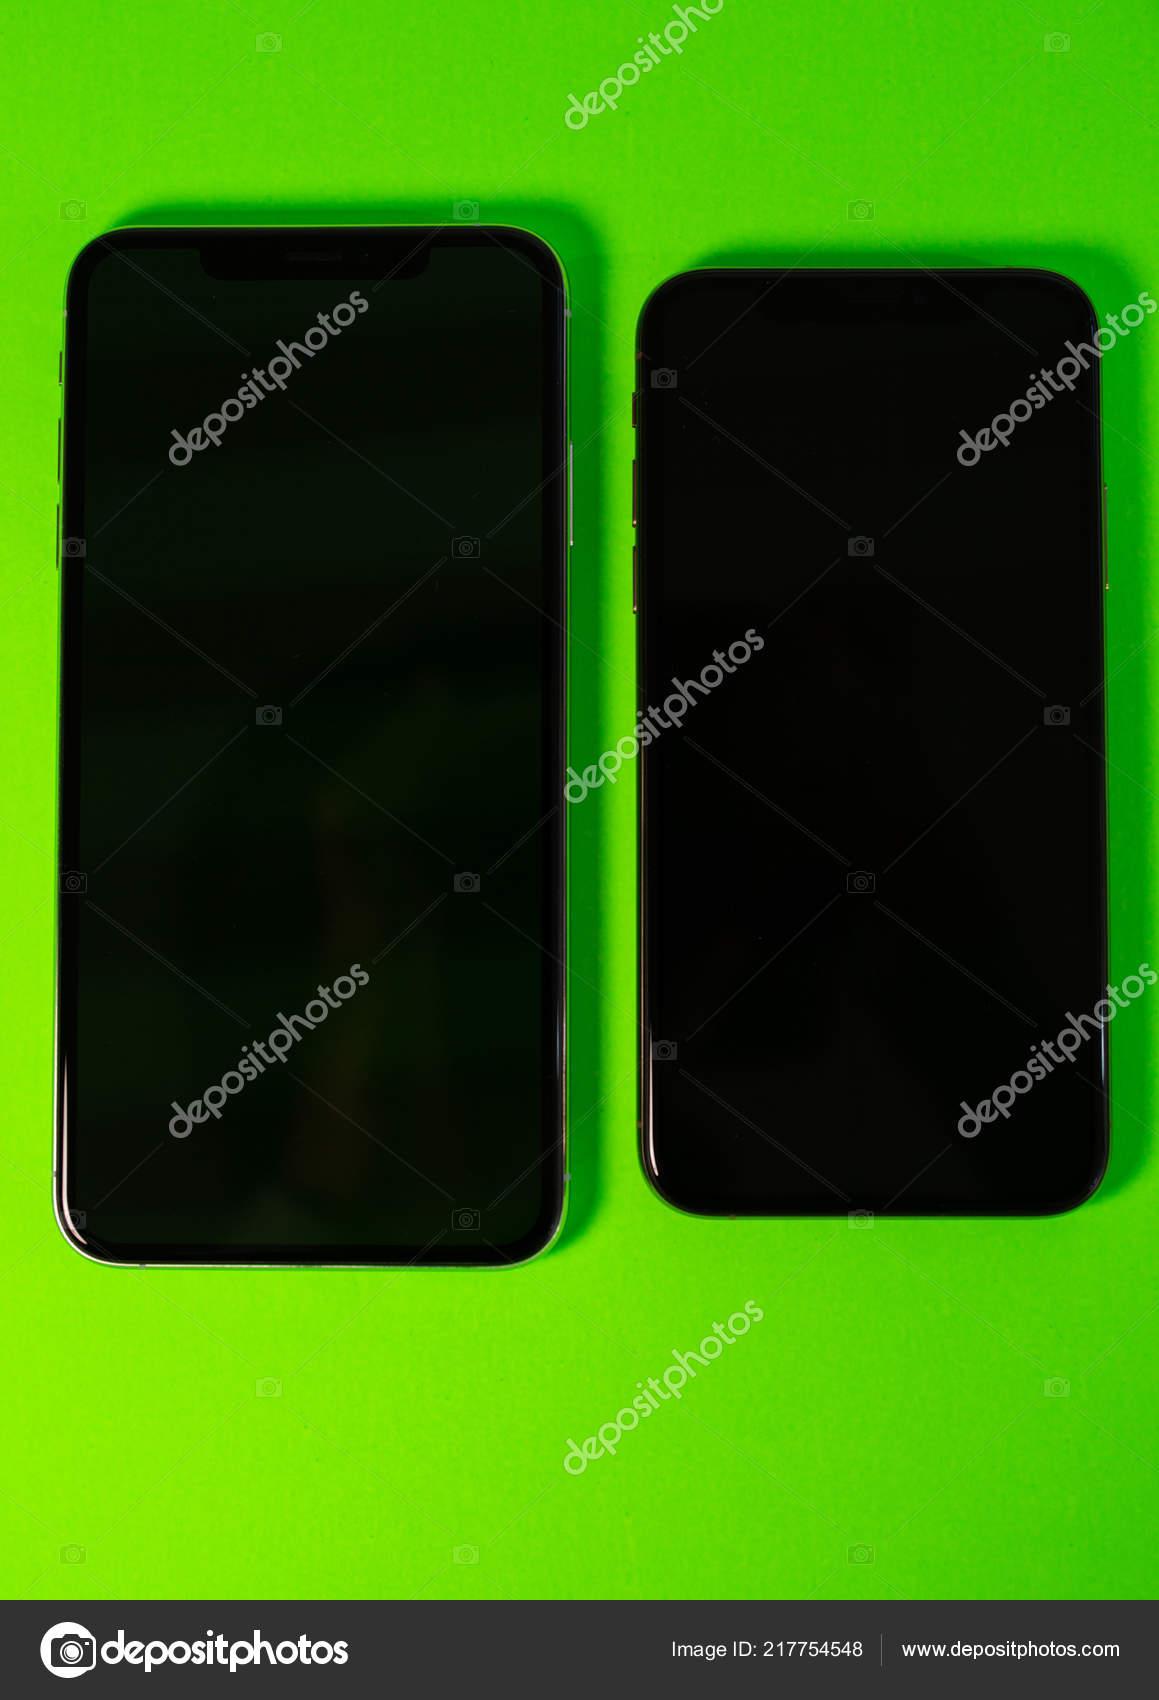 Iphone Apple Due Xs Max Su Sfondo Verde Vivace Foto Editoriale